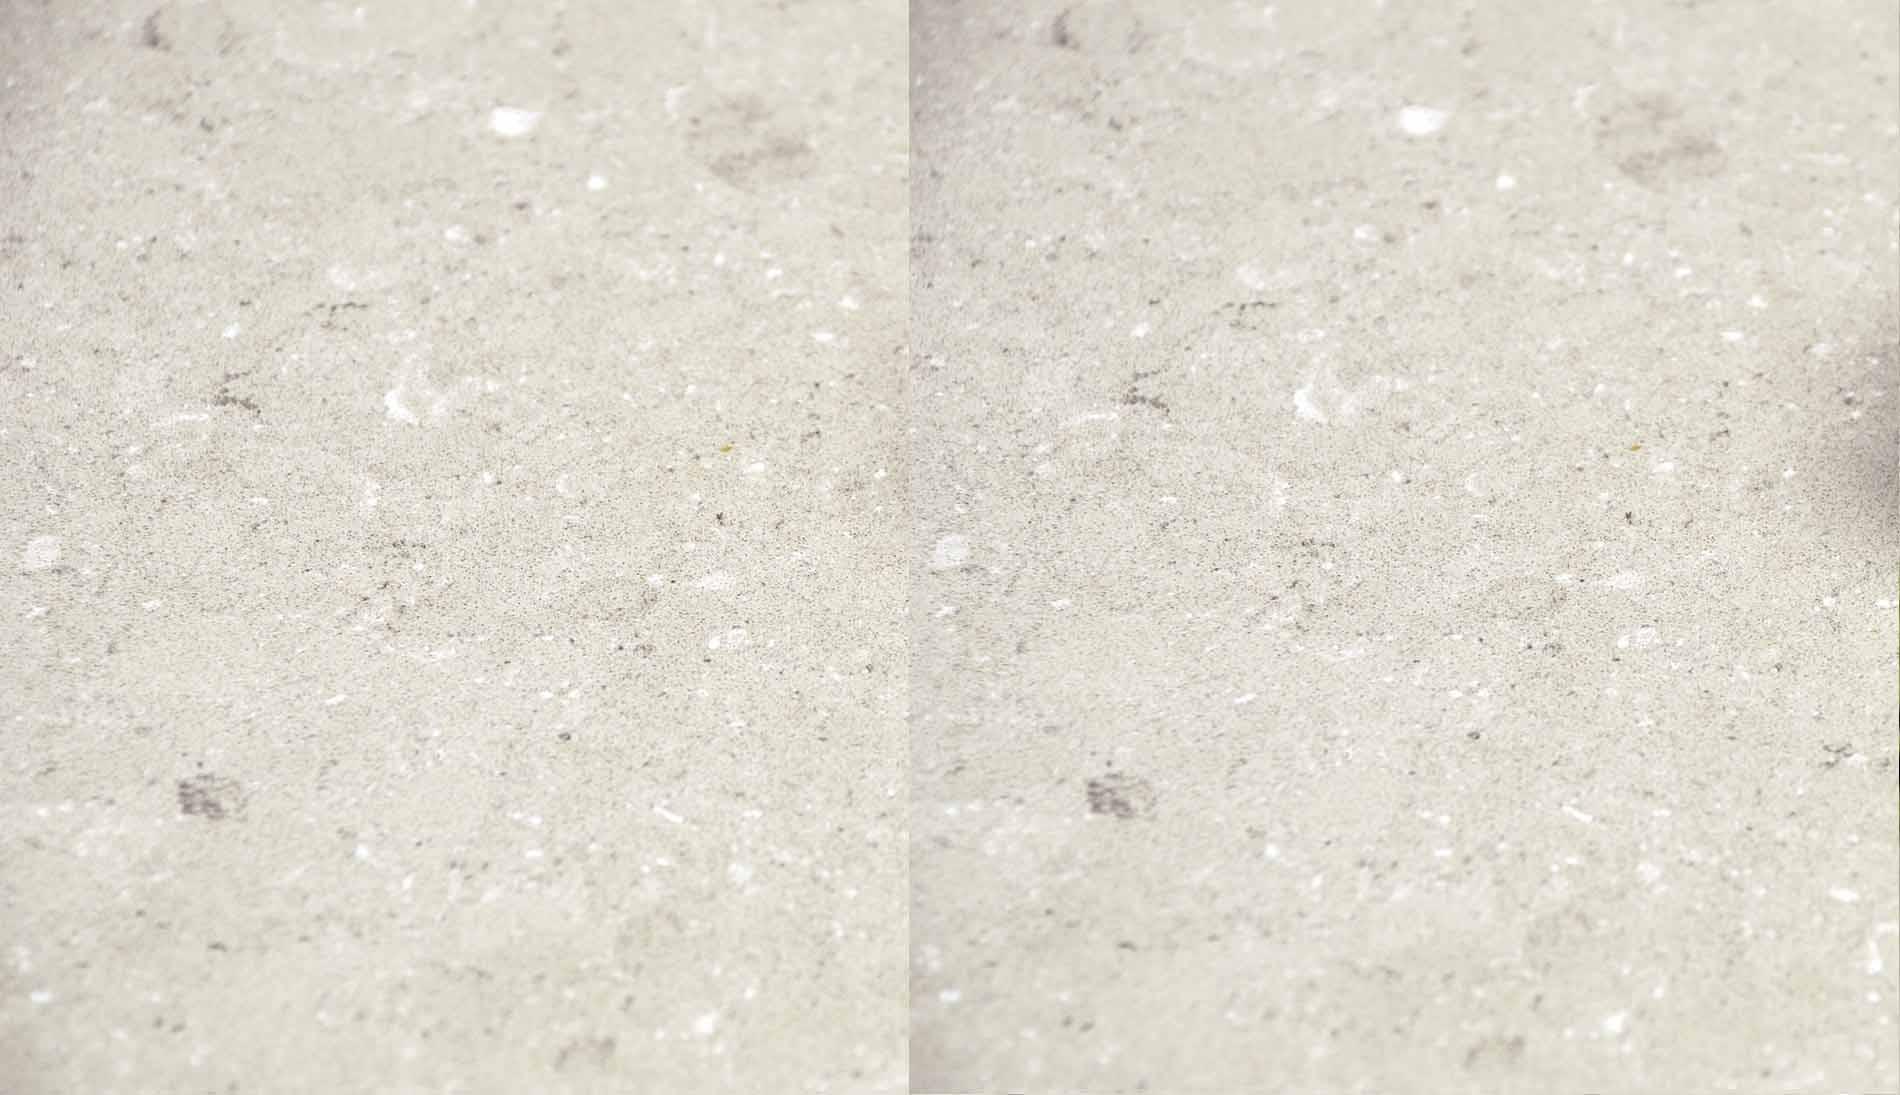 Waschtischplatten Formschone Waschtischplatten In Hochster Qualitat